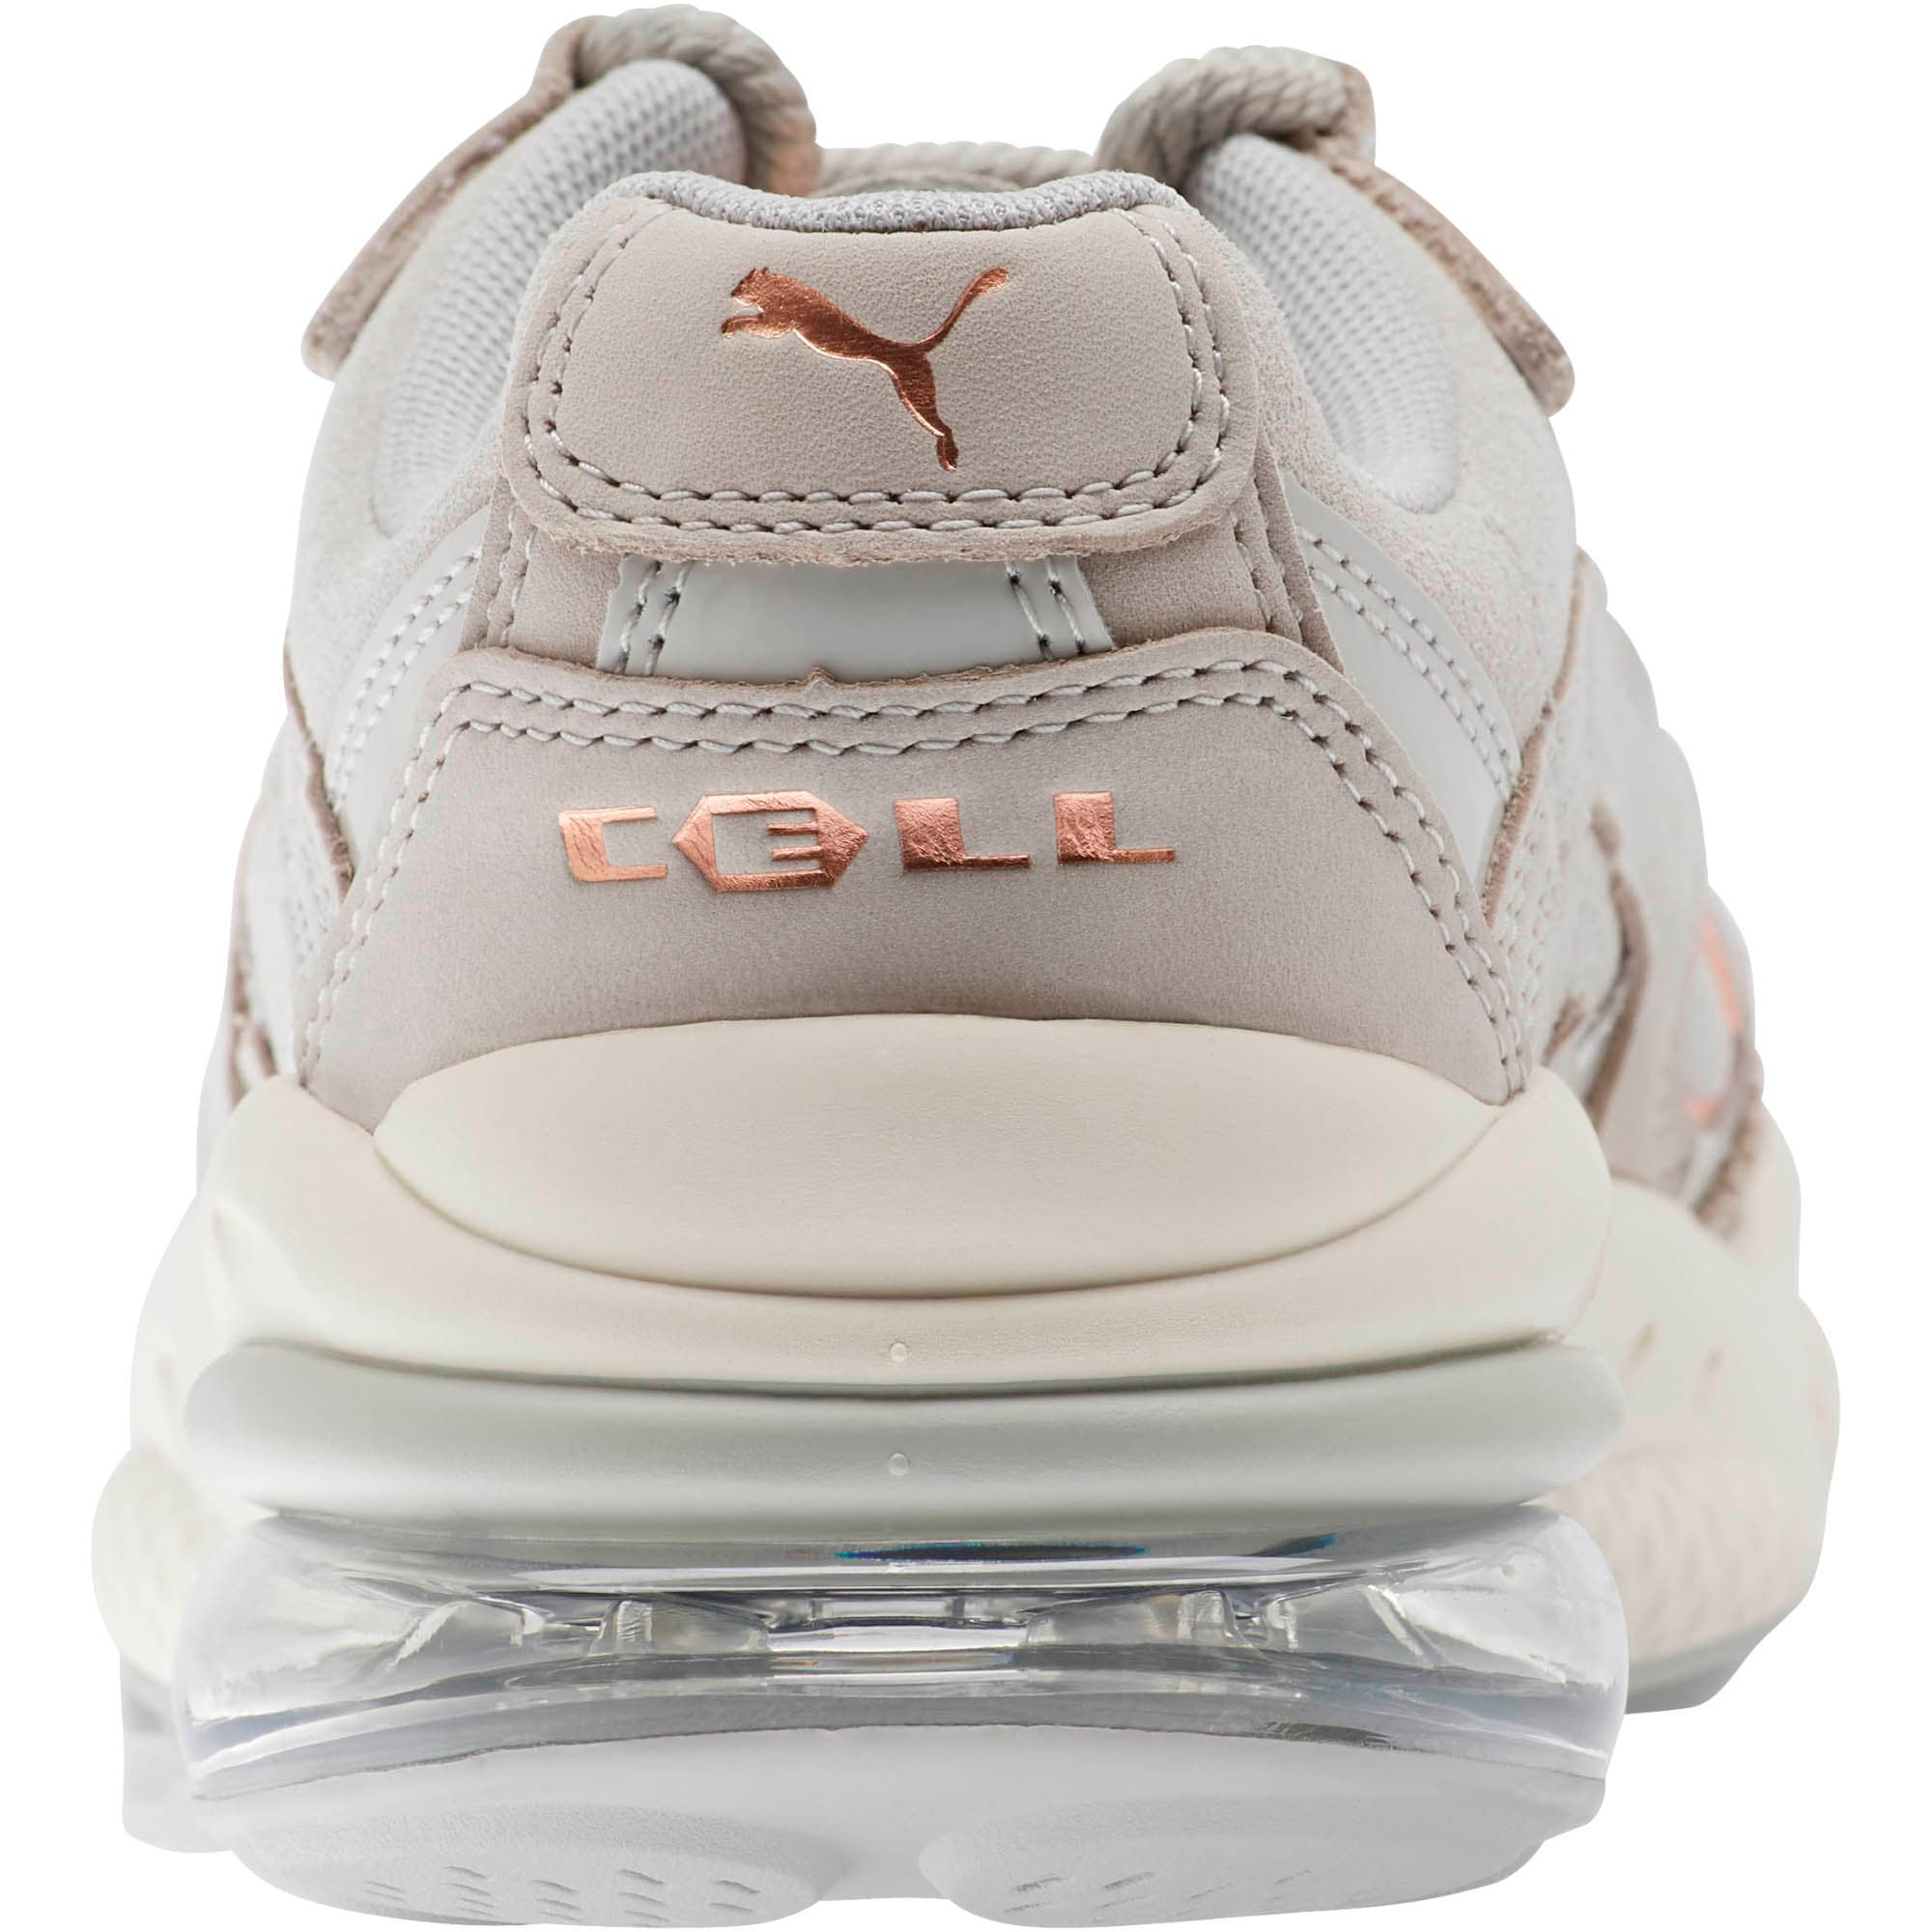 Thumbnail 3 of CELL Venom Patent Women's Sneakers, Gray Violet-Marshmallow, medium